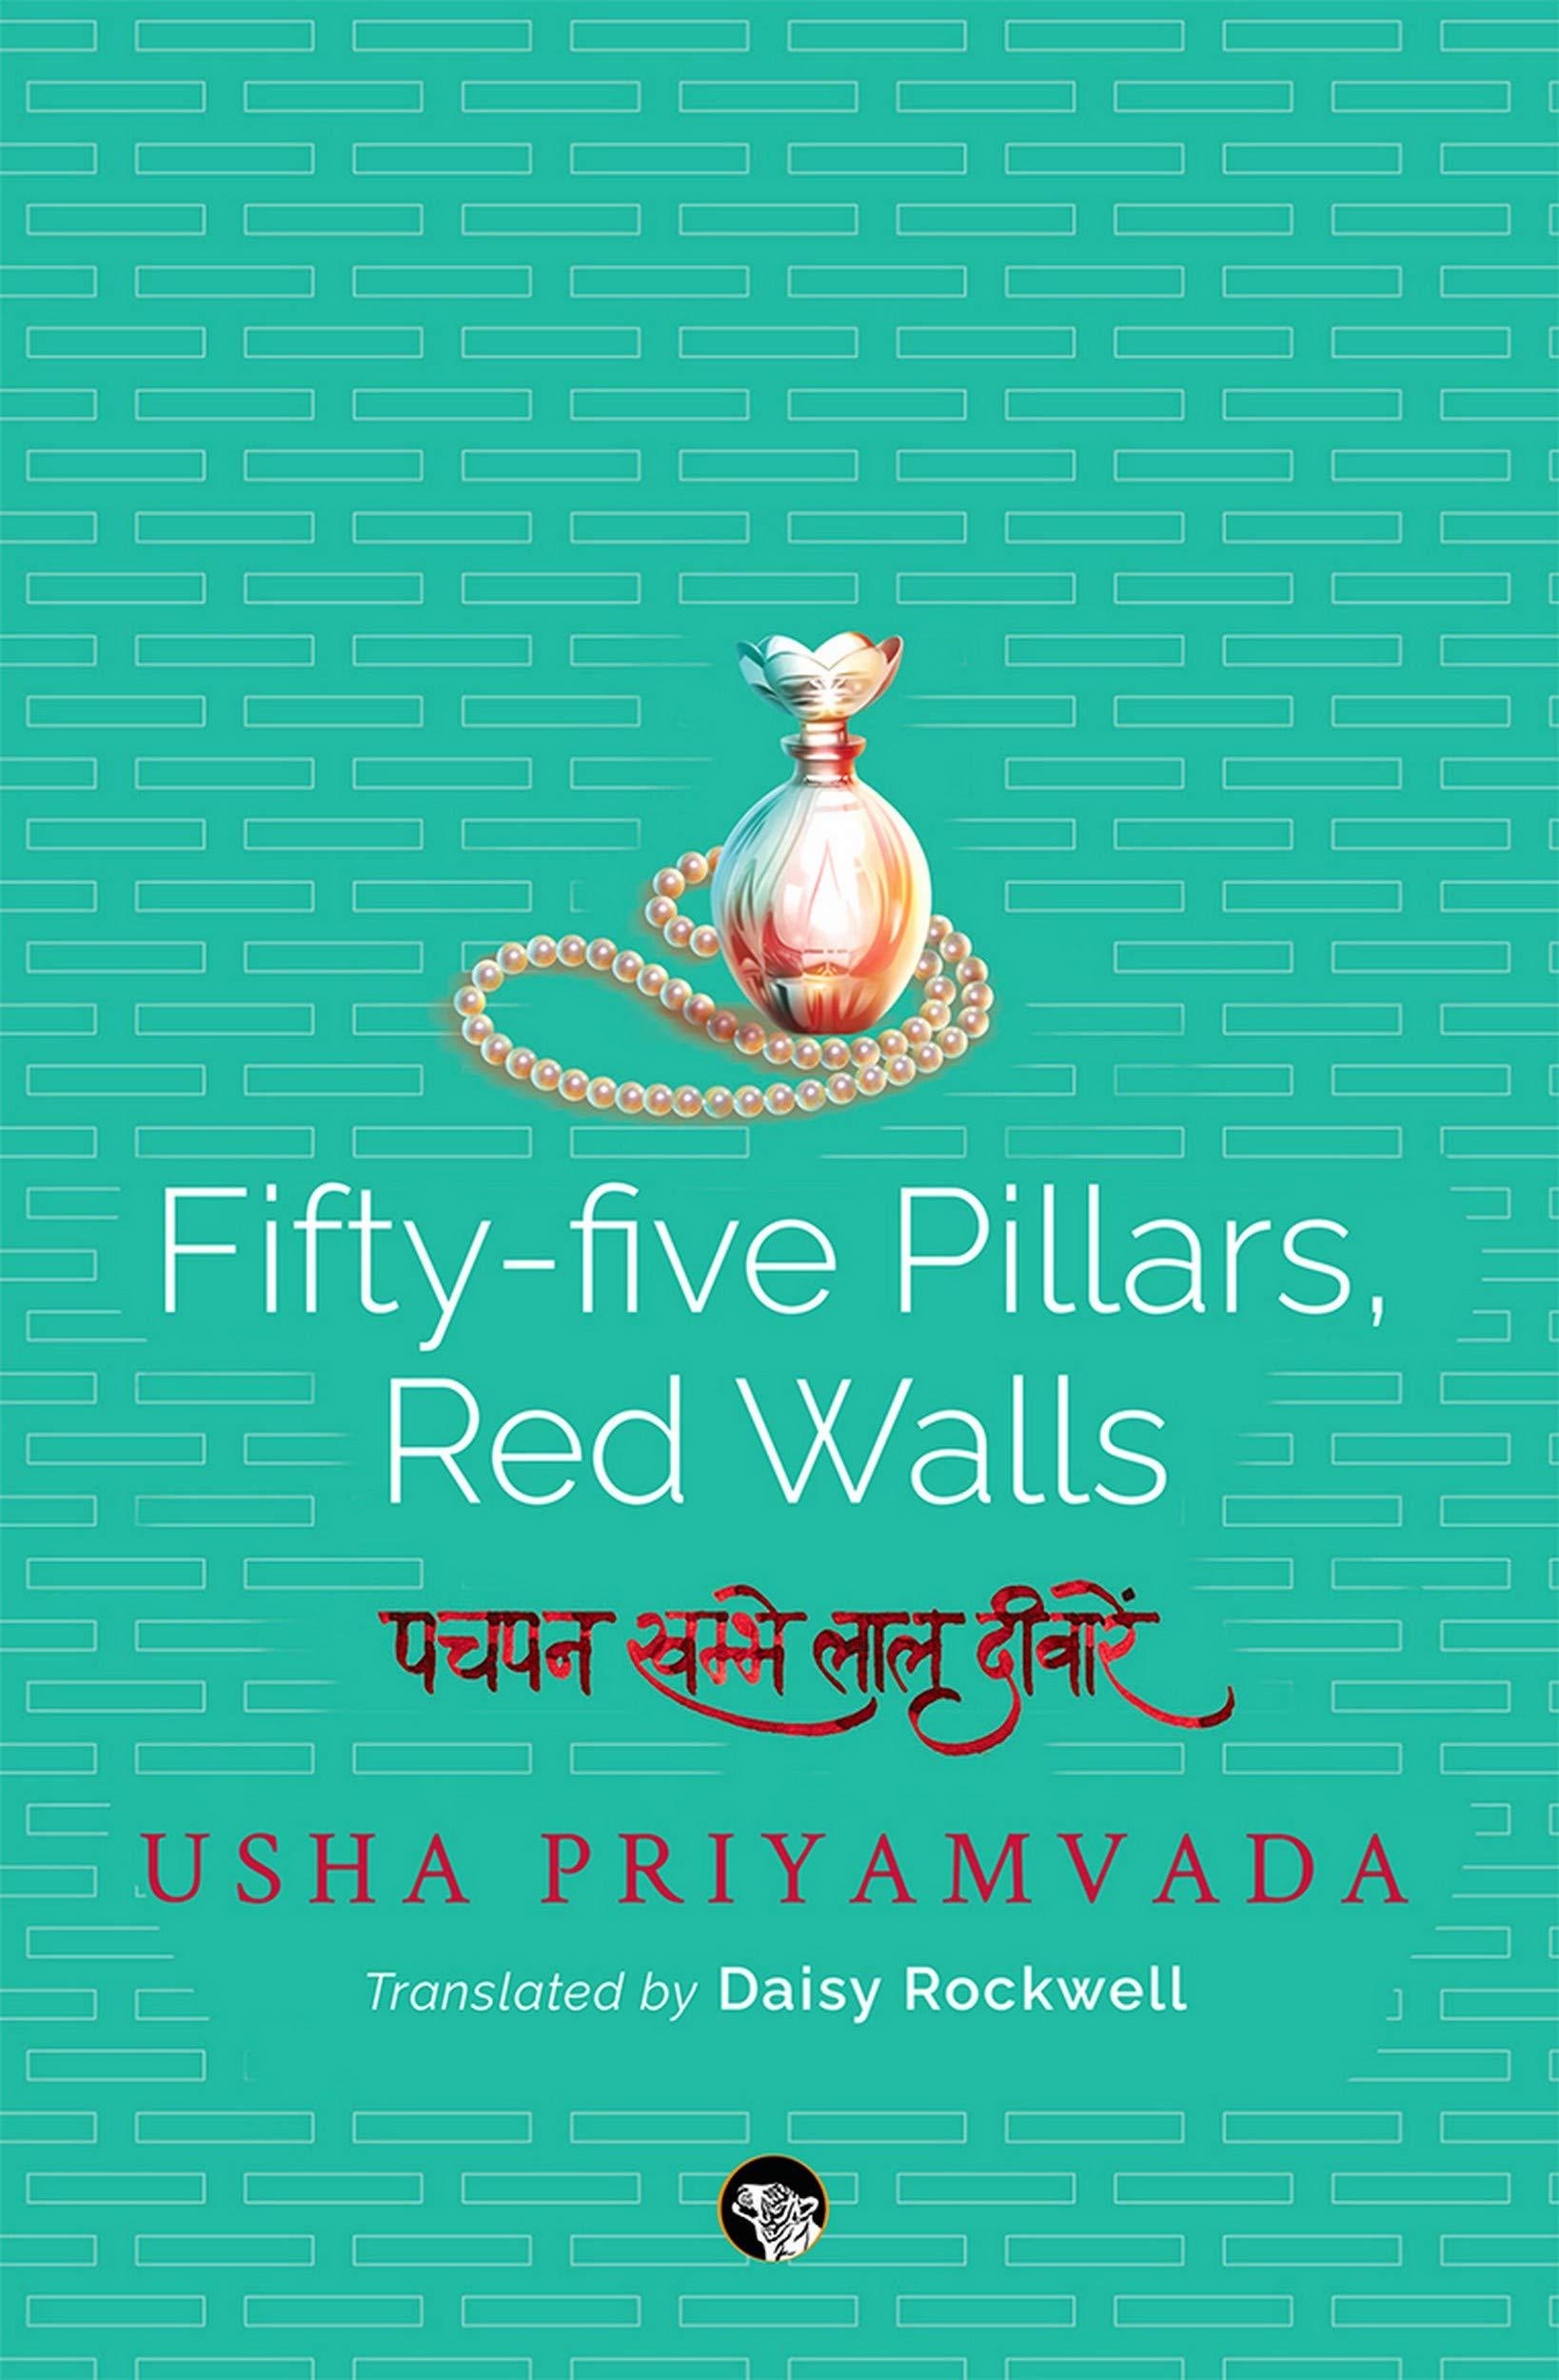 Book Review: Fifty Five Pillars, Red Walls by Usha Priyamvada